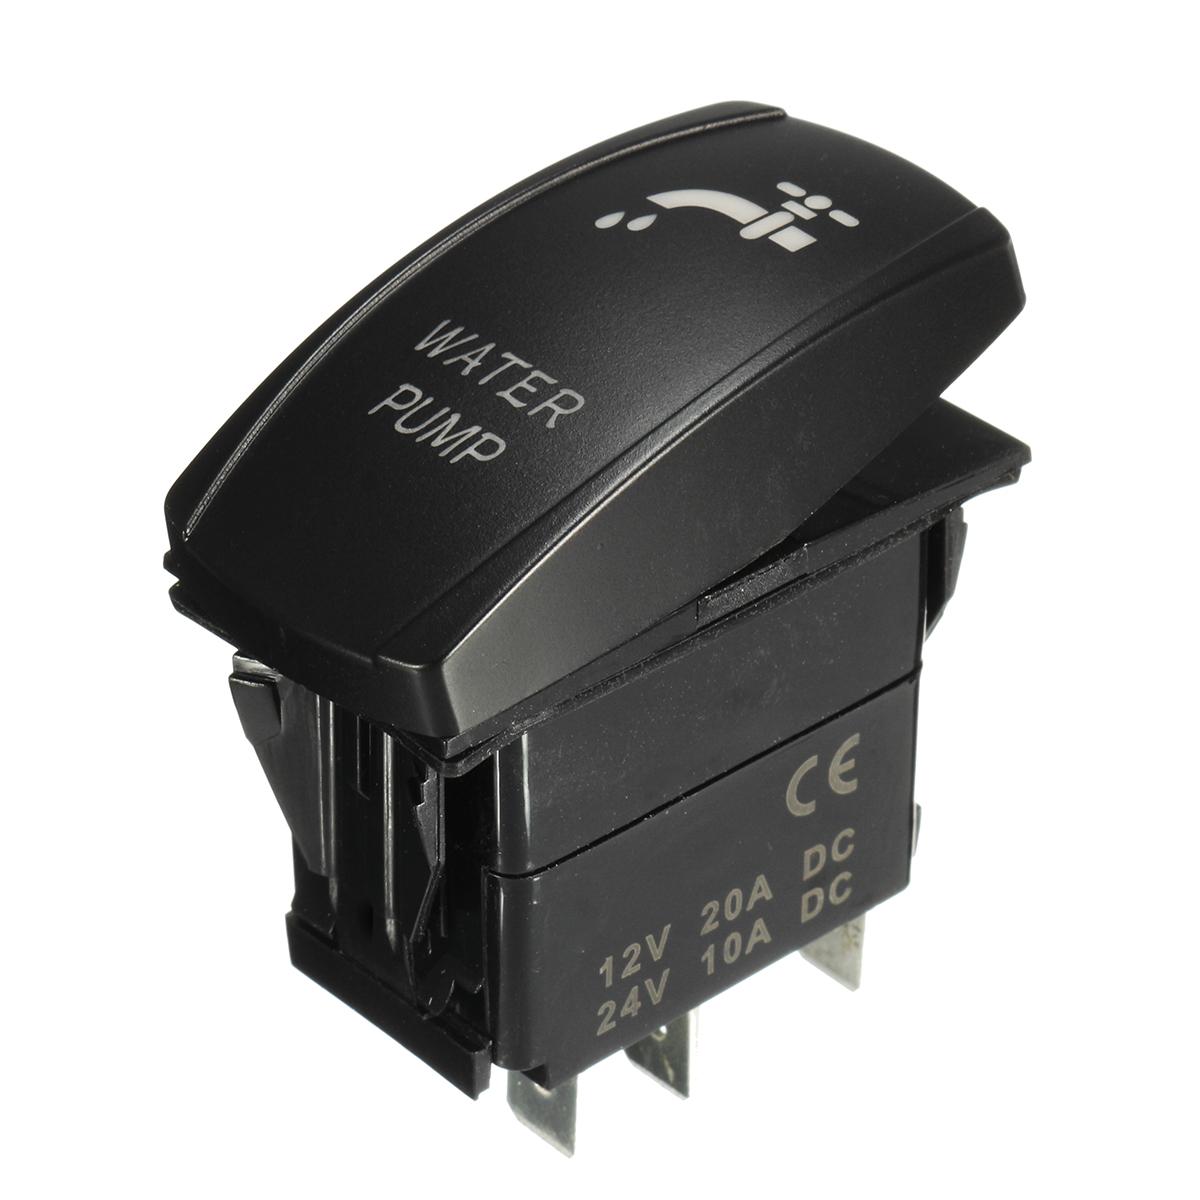 SPST 12V 20A 5Pin ON/OFF Rocker Toggle Switch Water Pump LED Rocker Switch